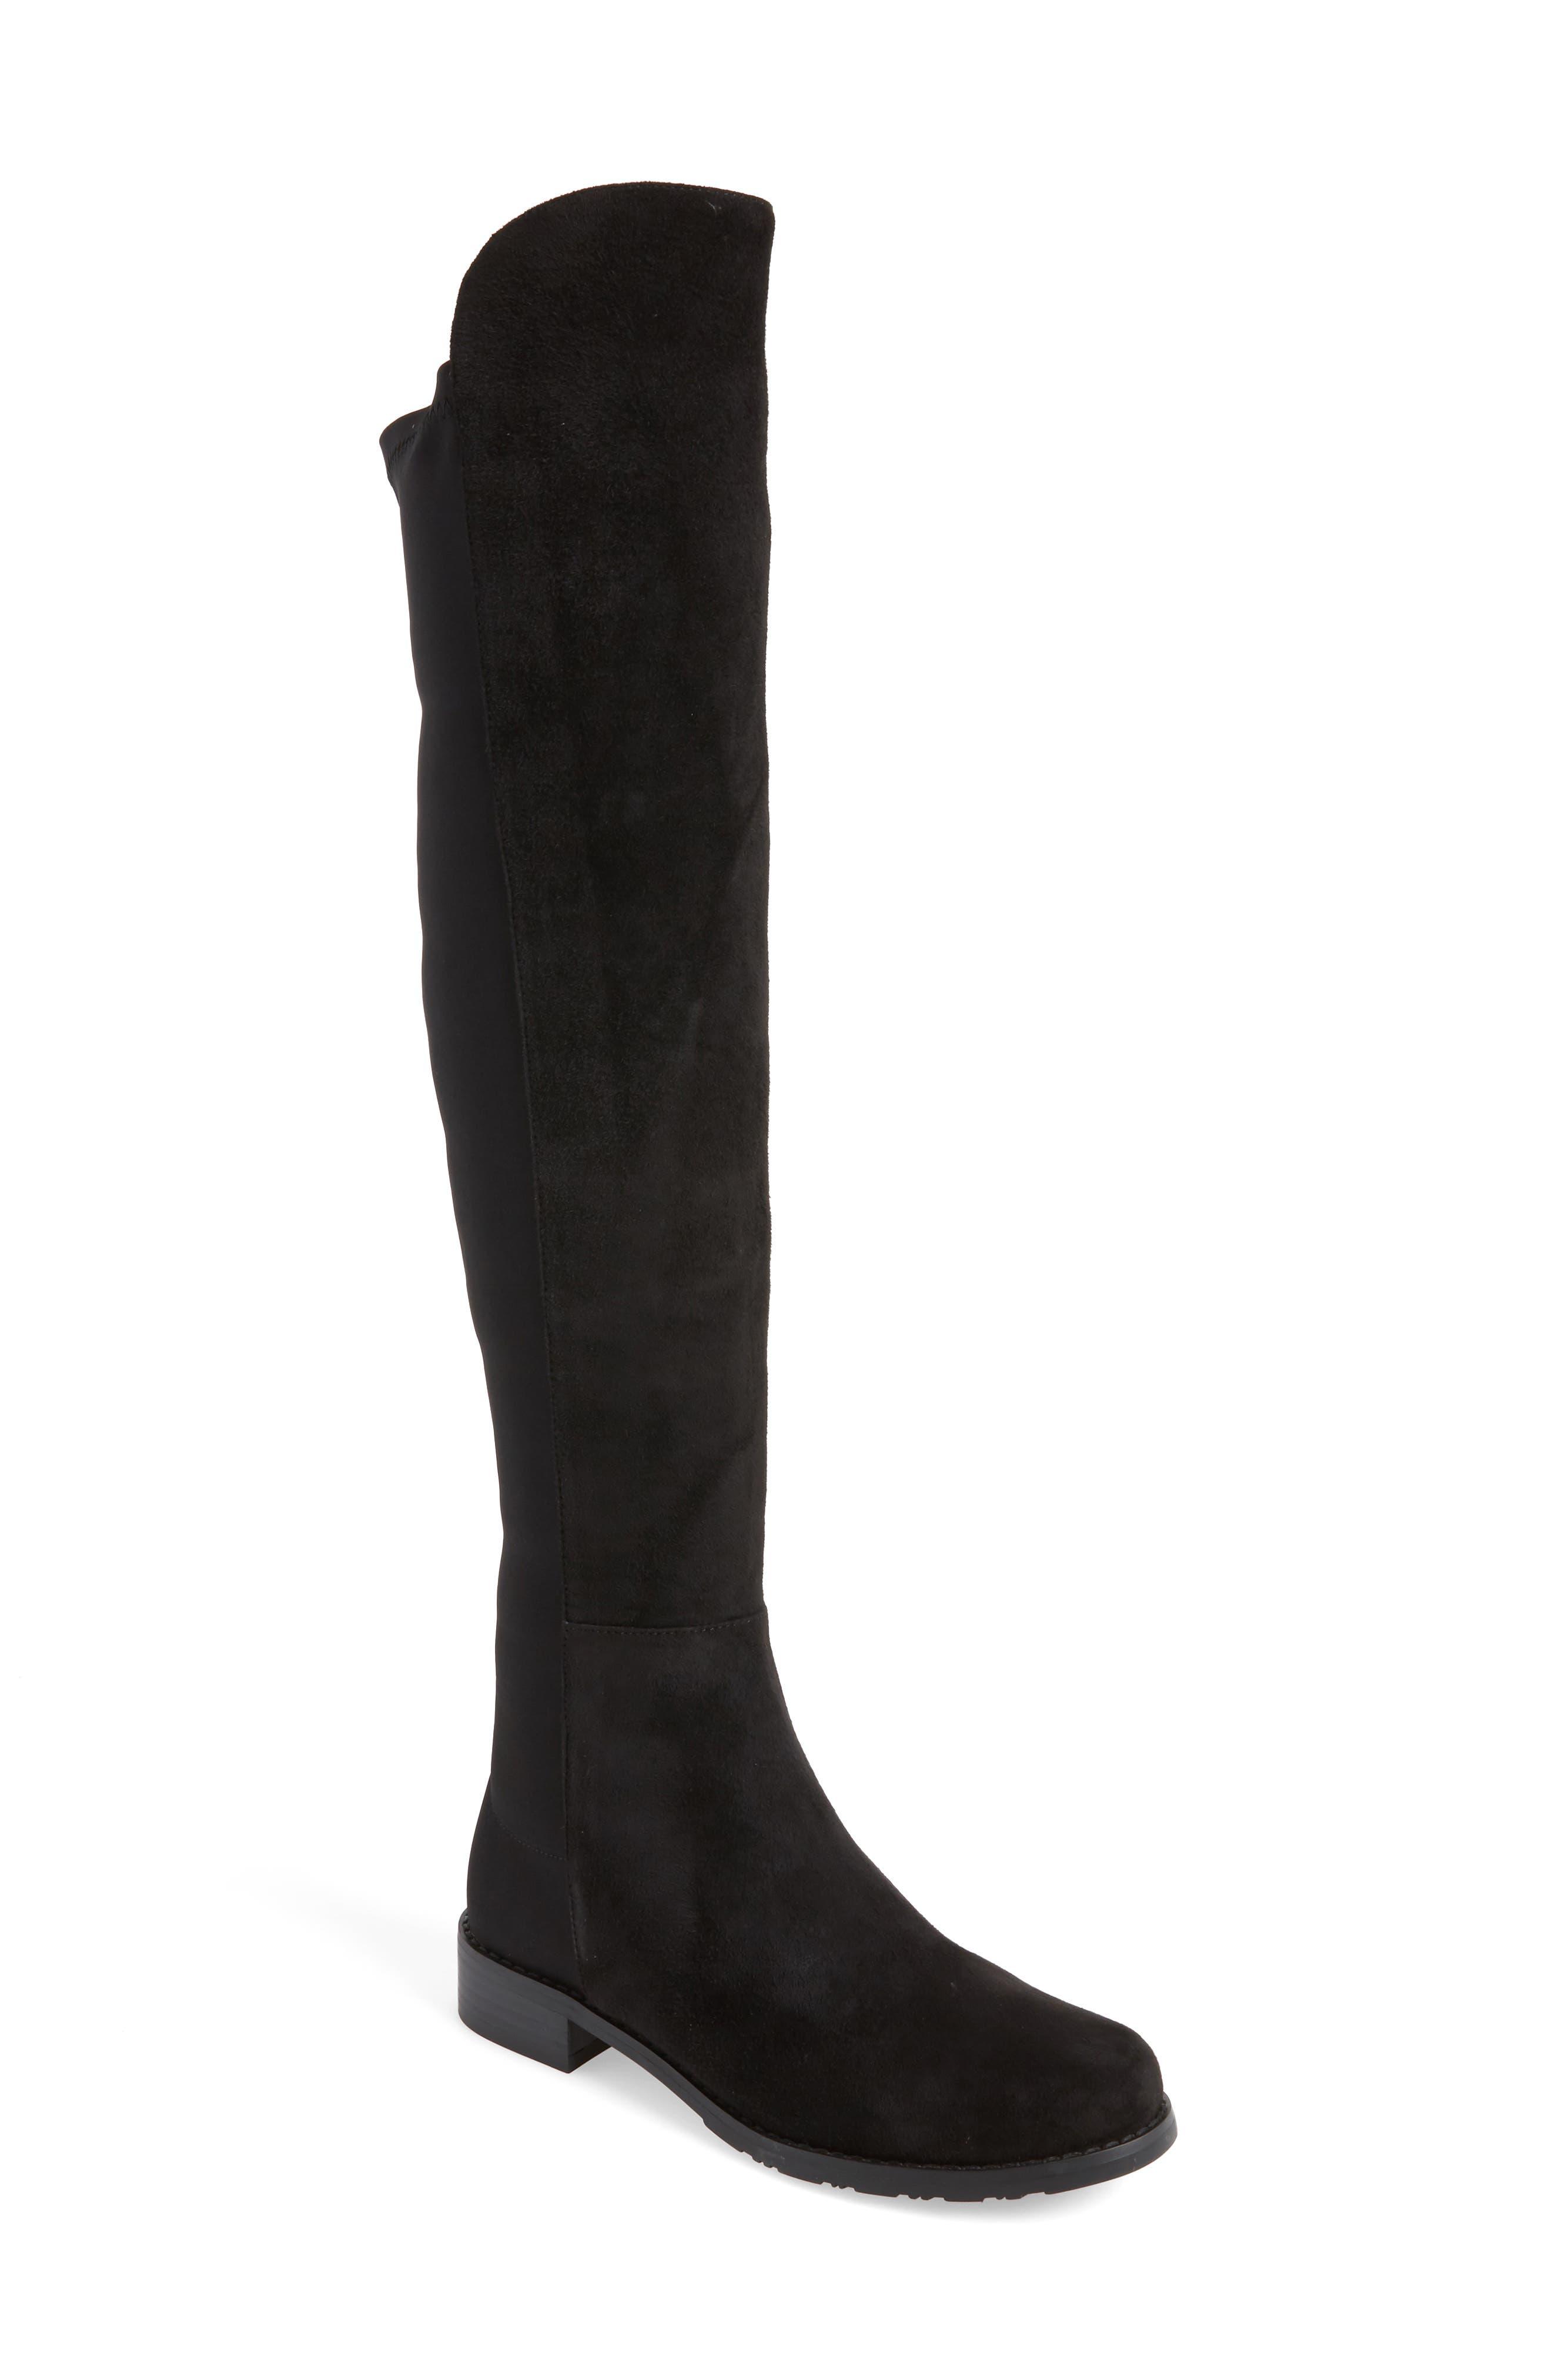 Panache Tall Boot,                             Main thumbnail 1, color,                             Black Suede